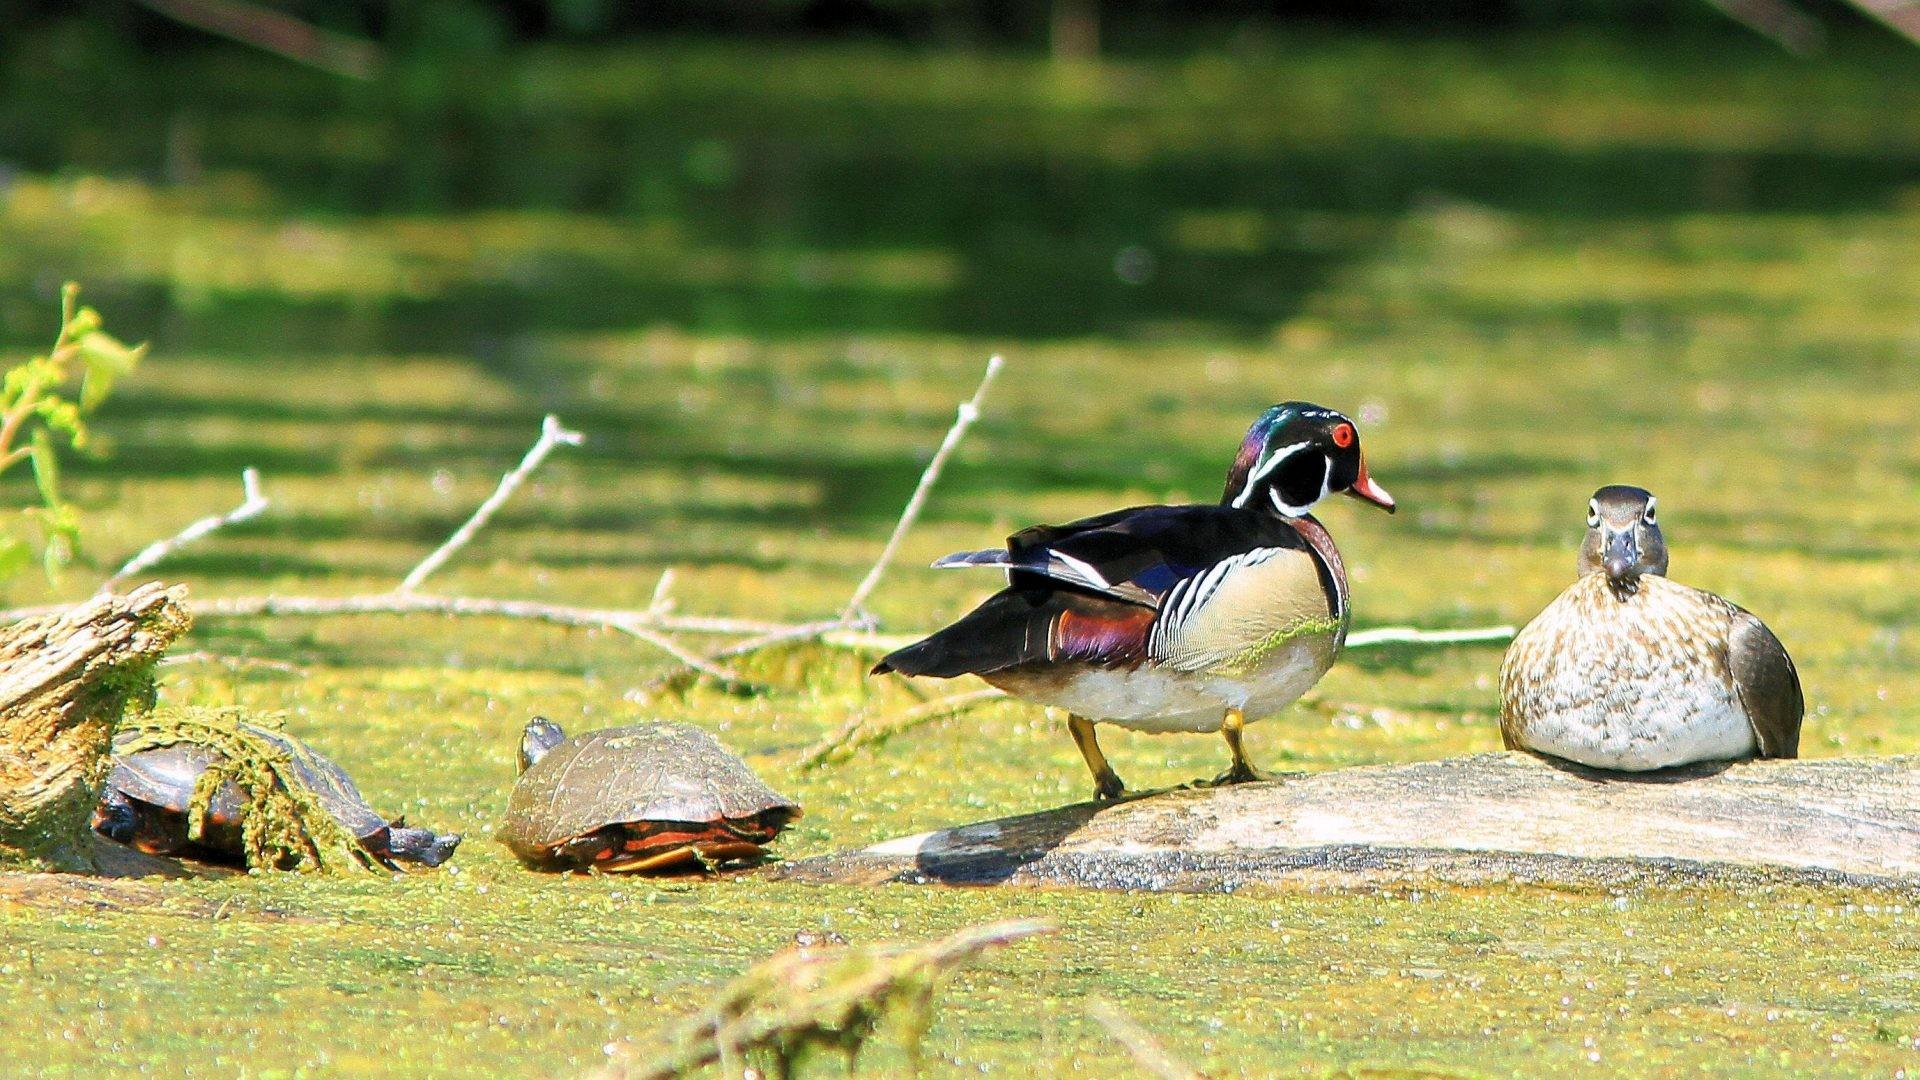 Res: 1920x1080, Duck Bird Wood Ducks Baby Images Free